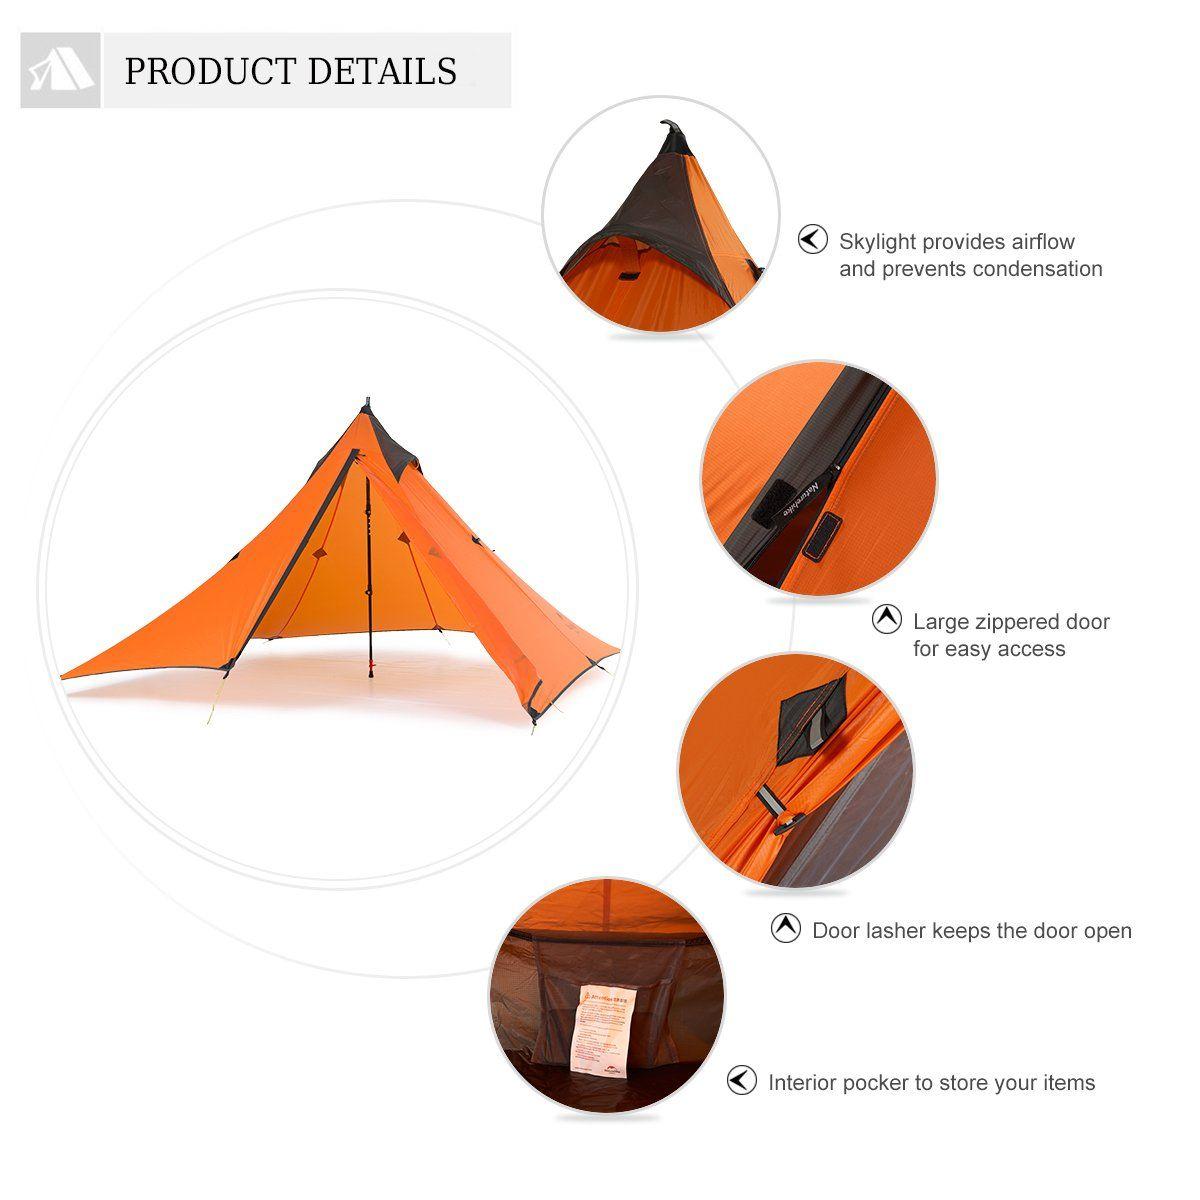 Naturehike Trekking Pole Tent Ultralight 1 Person 3 Season Tent Lightweight Pyramid Tent For Mountaineering Hiking Camping Trekking Pole Tent Tent Camping Tent